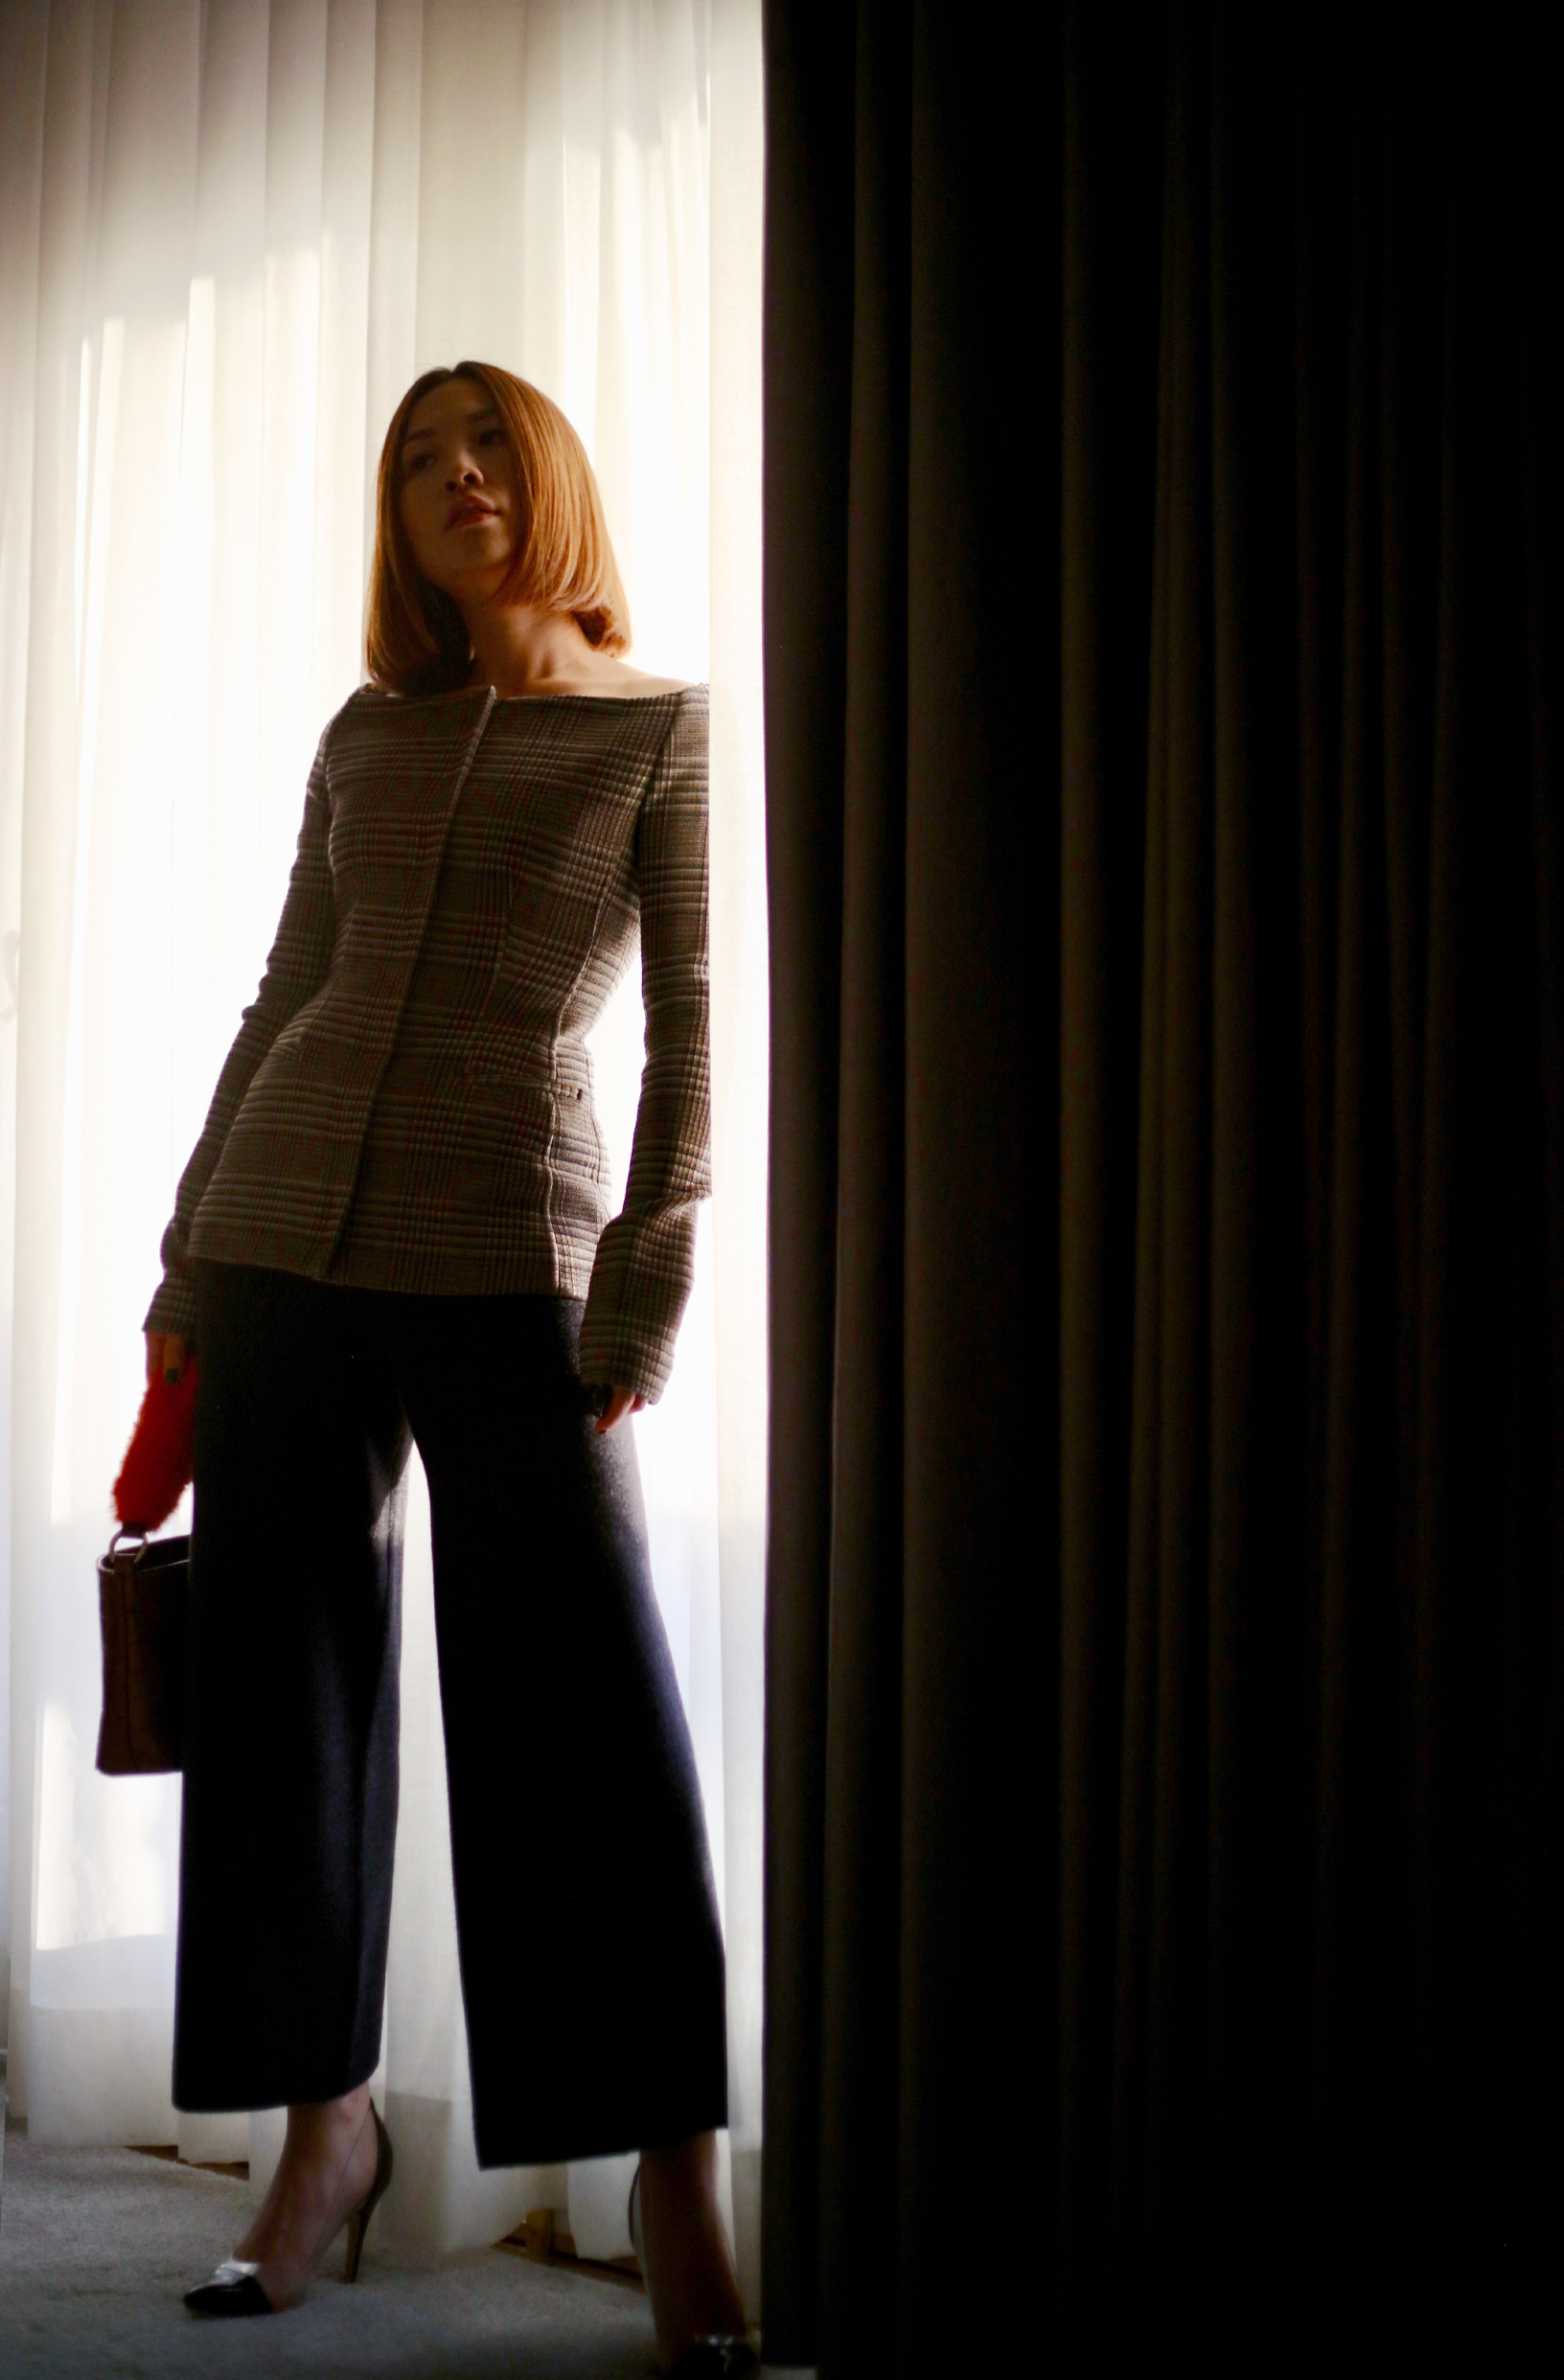 chic style fashion blogger tracy qiu.JPG